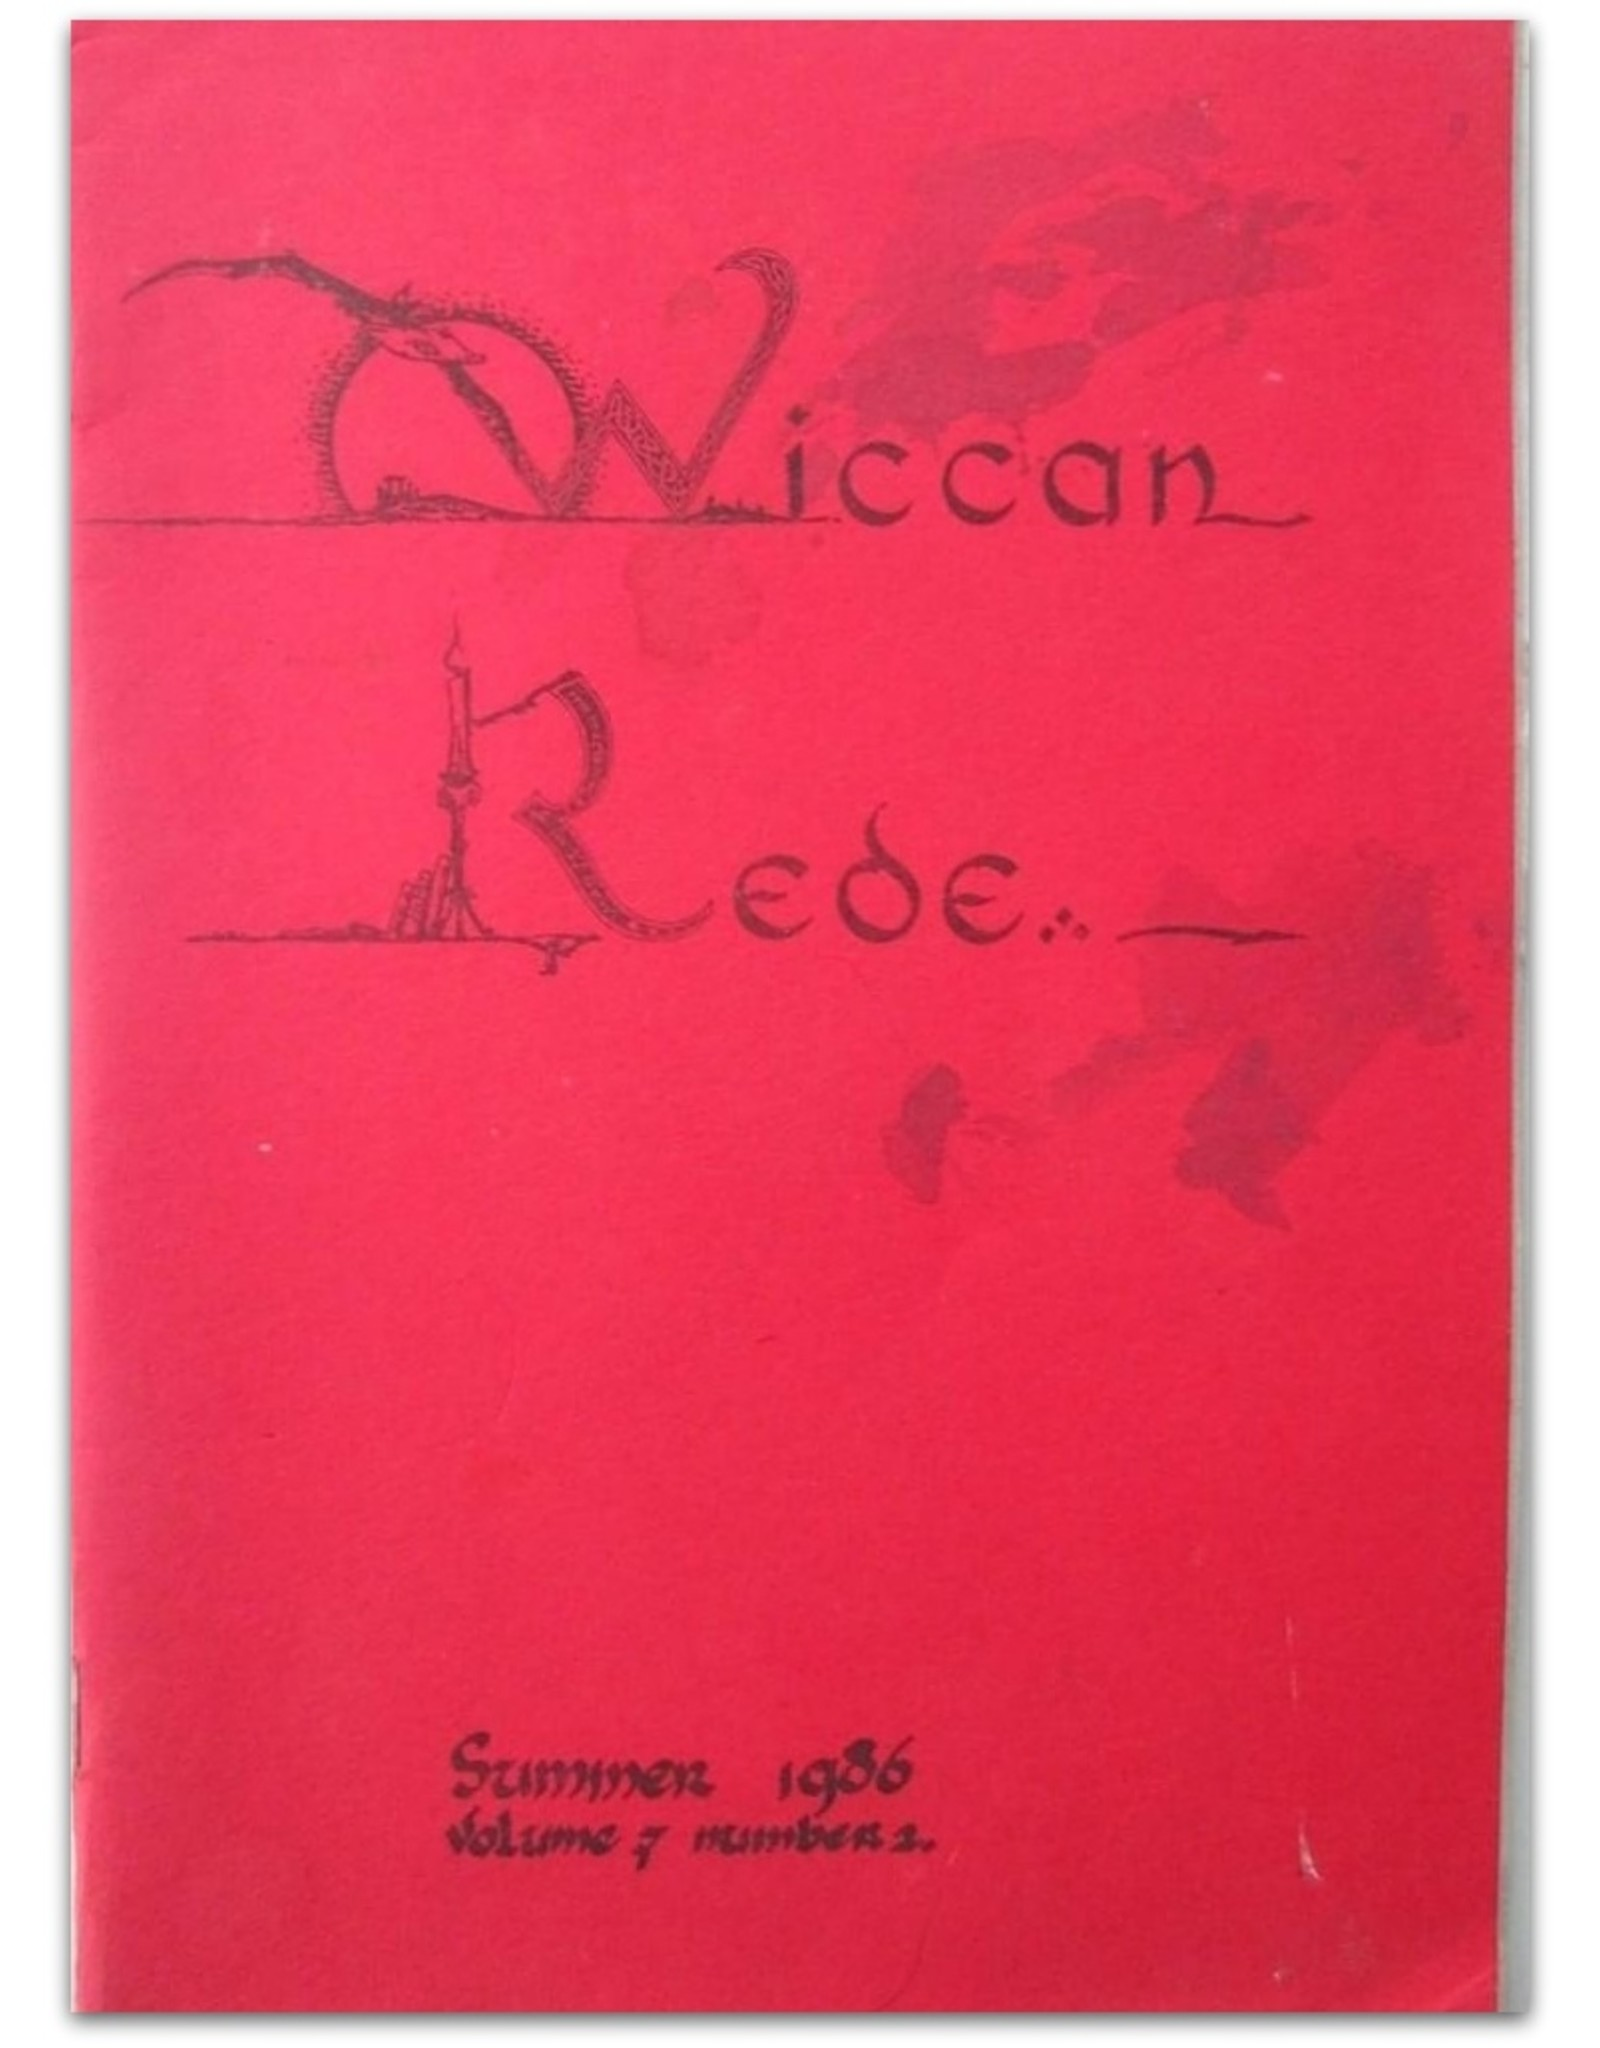 Lot met 4 Wiccan Rede magazines